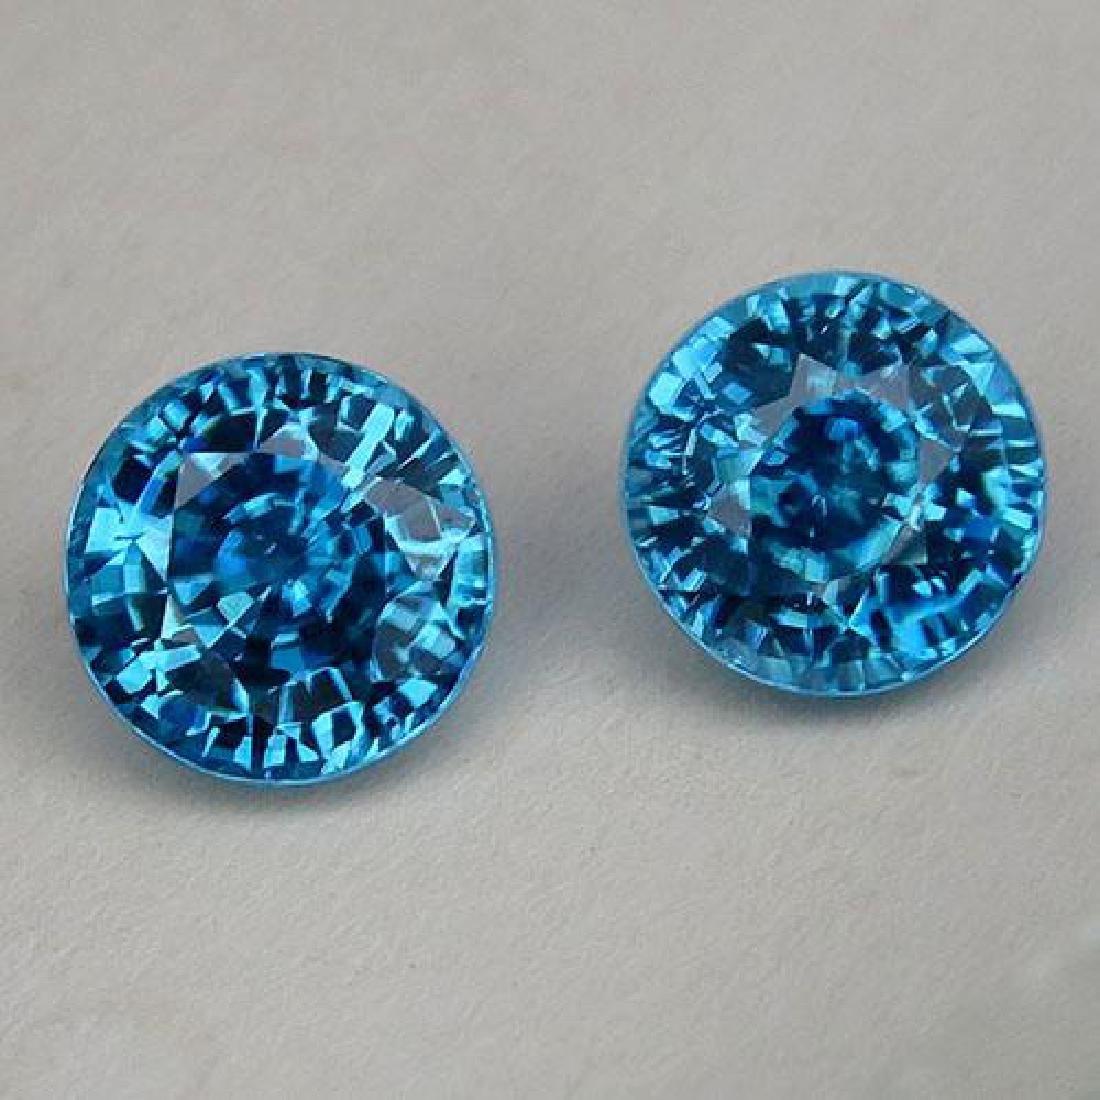 Natural Combodian Rare Blue Zircon 4.75 Ct - VVS